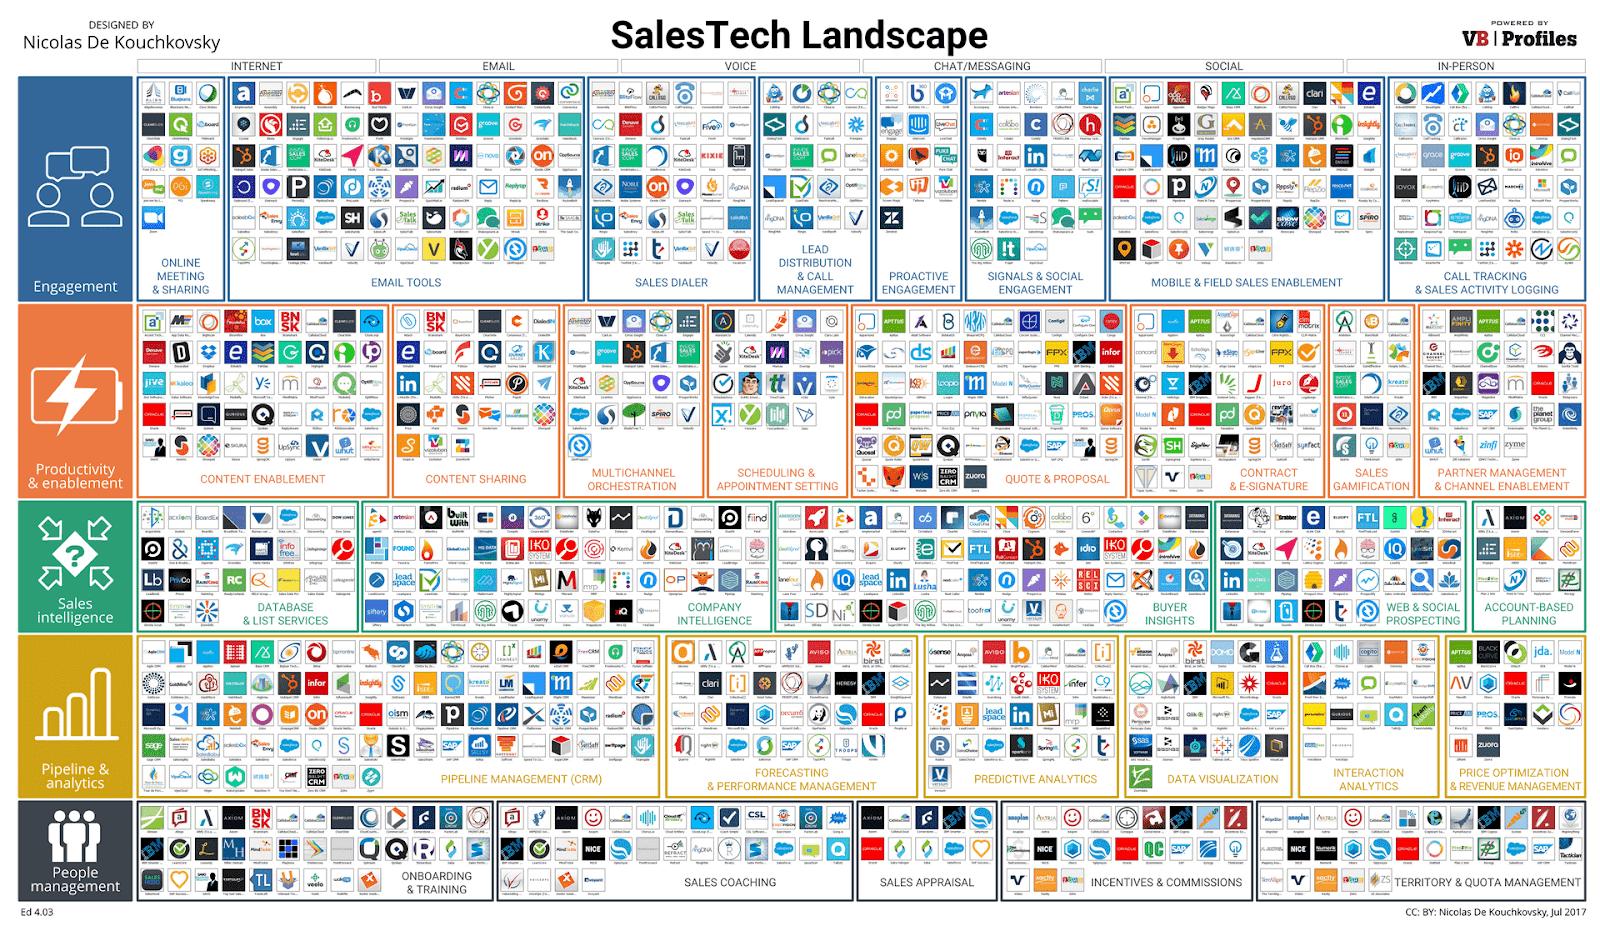 Salestech Landscape 1